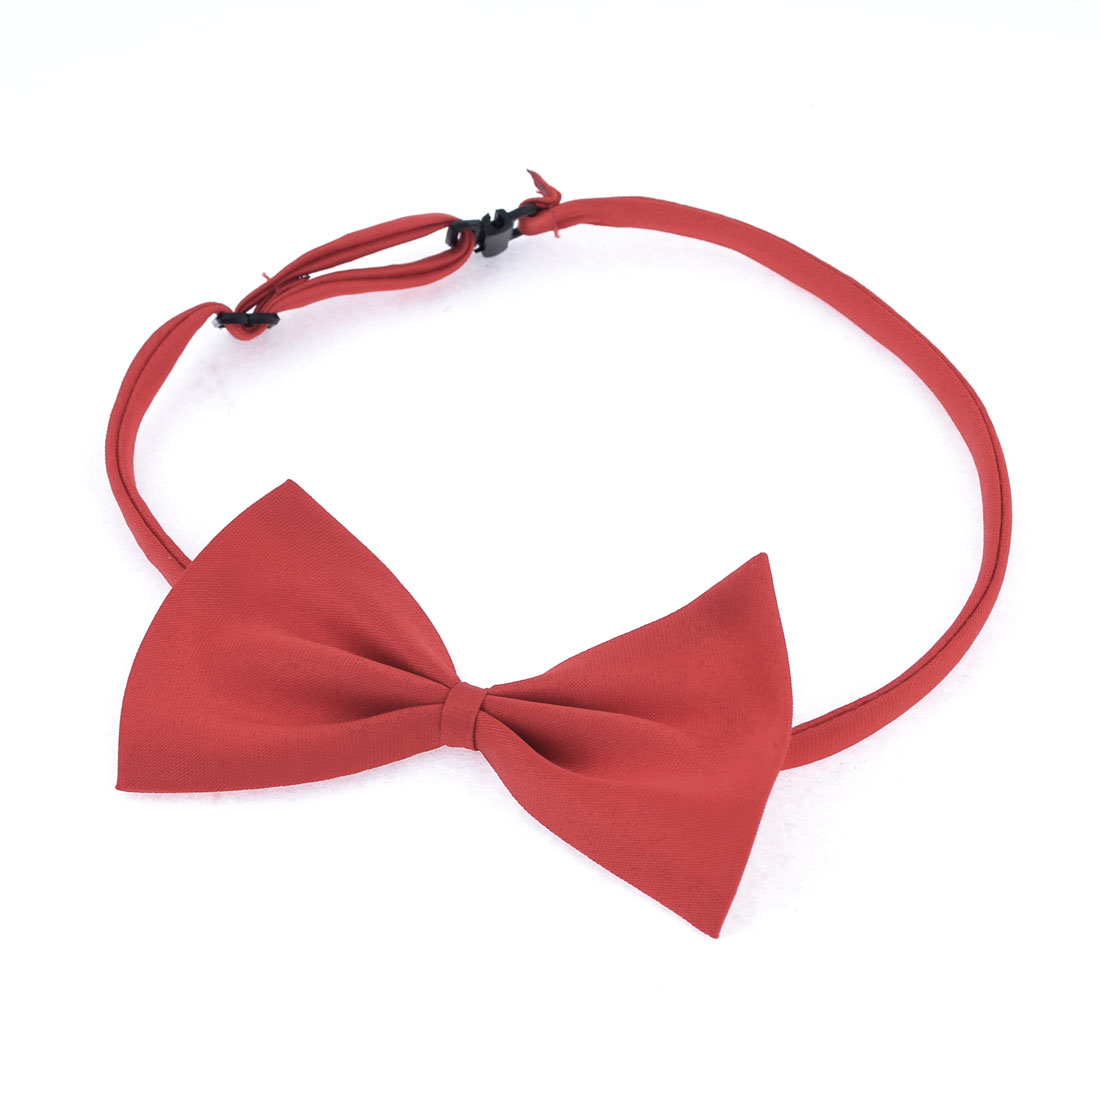 Wedding Dress Pre-tie Stylish Adjustable Neckwear Bow Tie Necktie Red